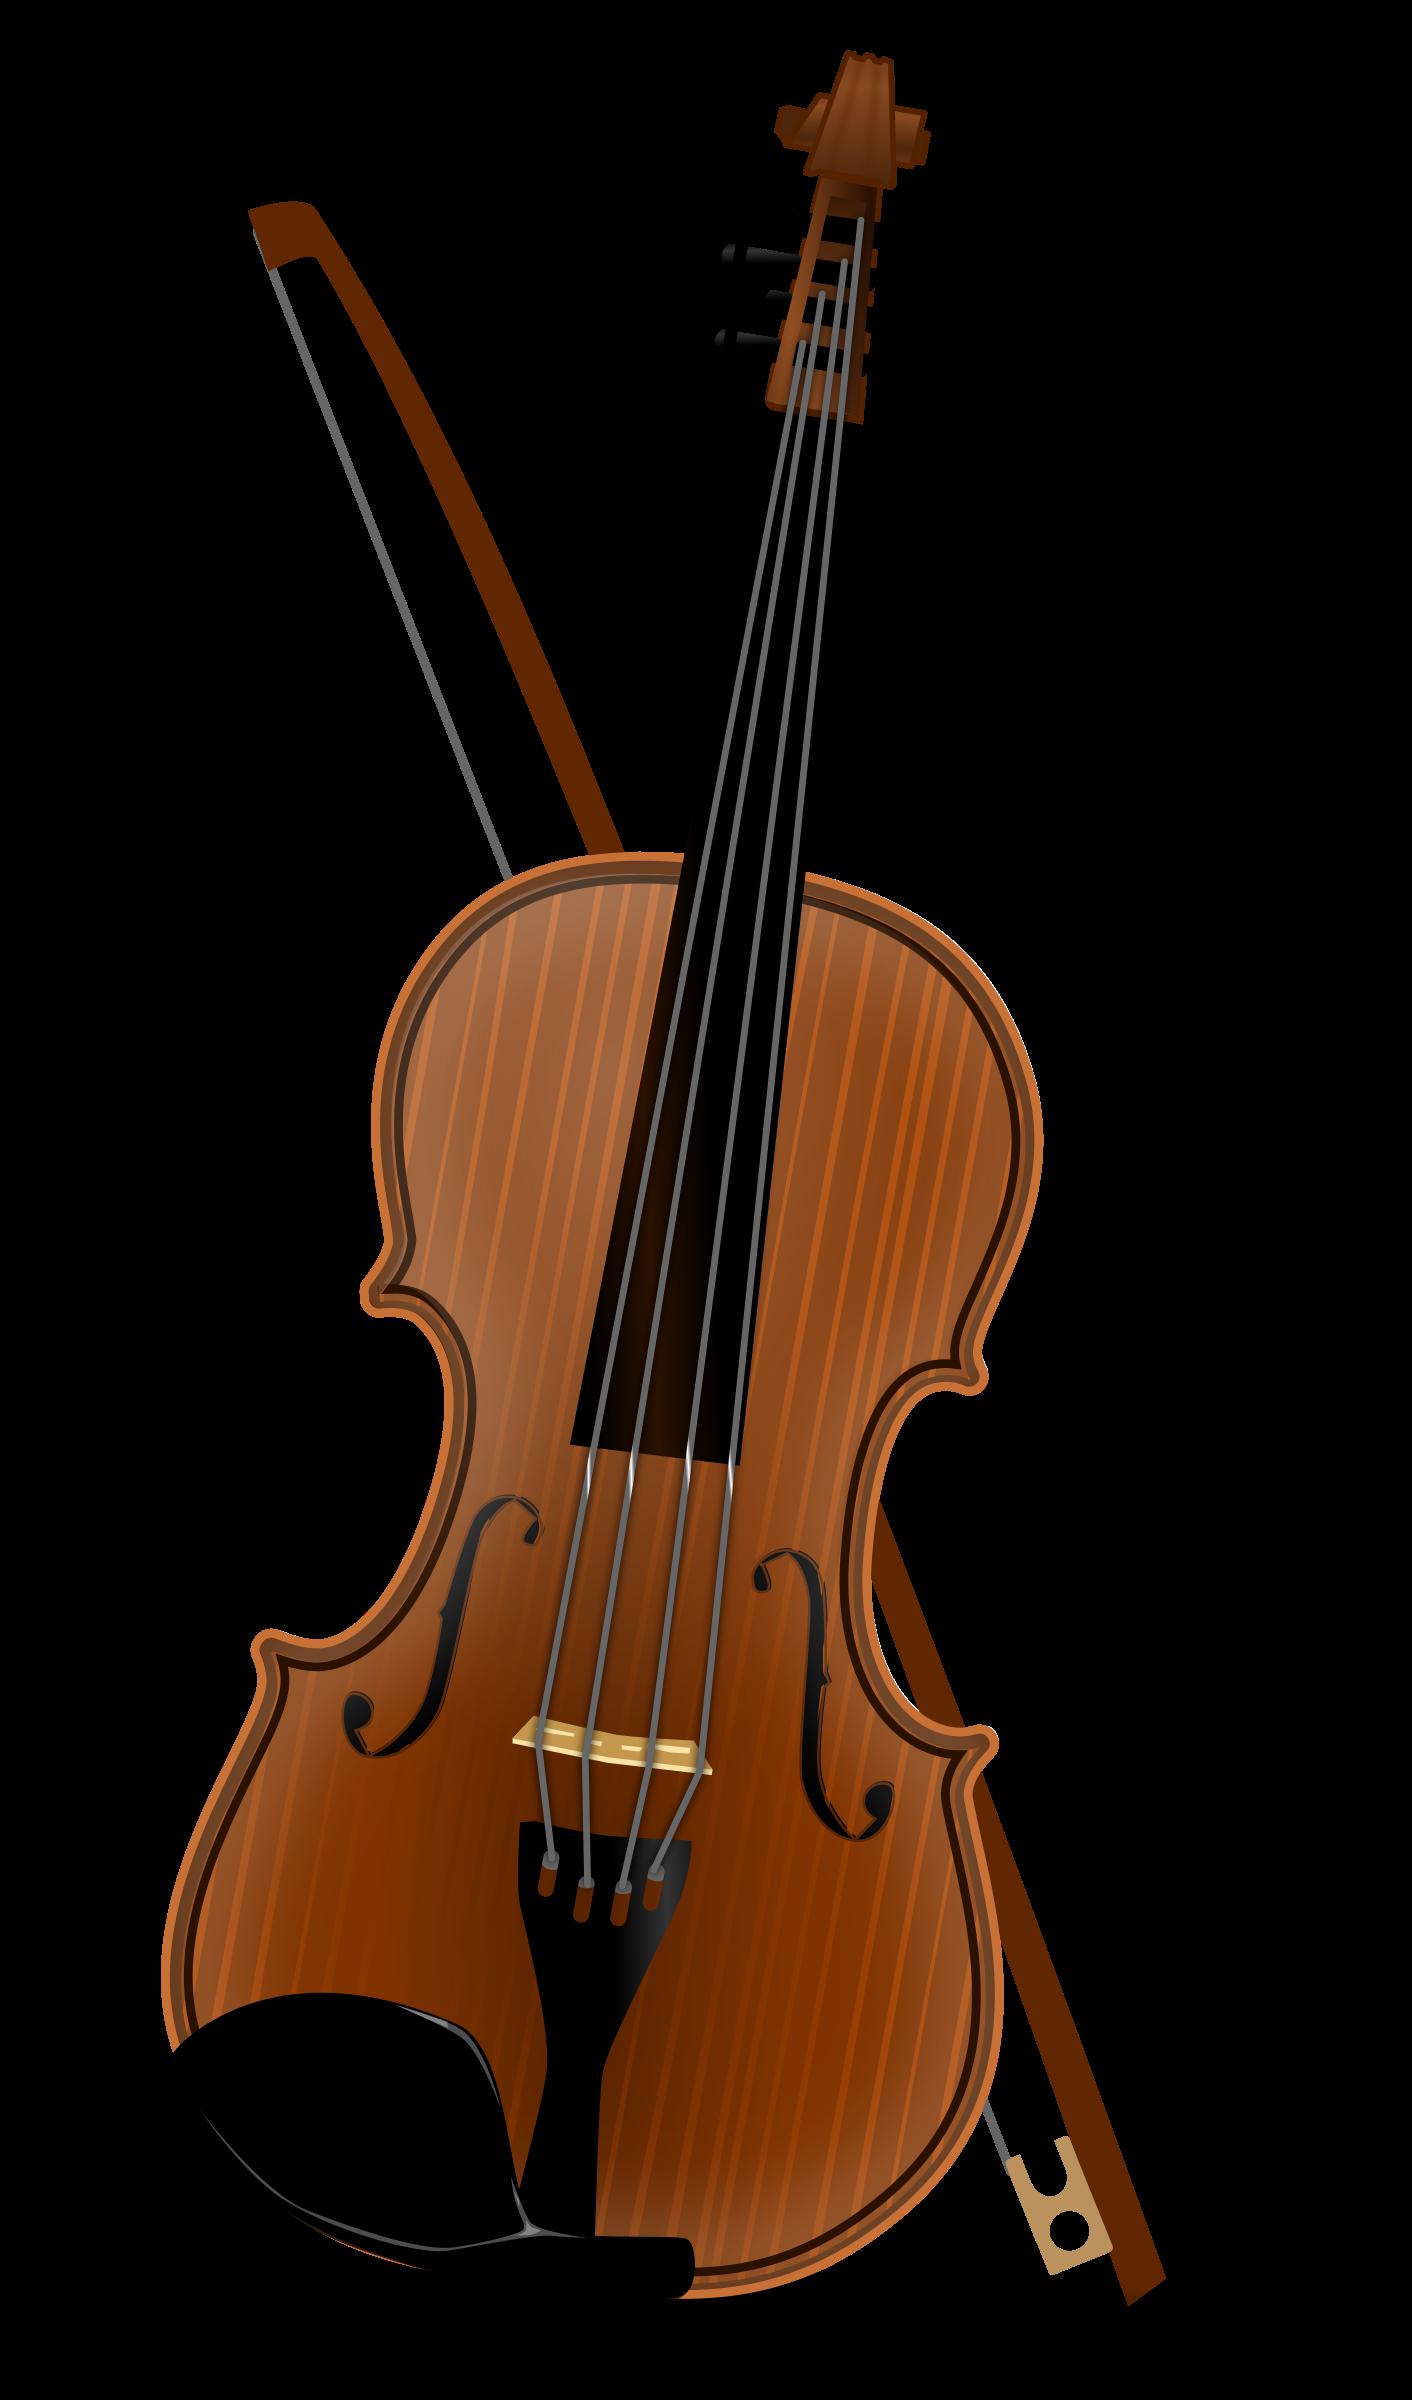 Instruments clipart viola. Violin